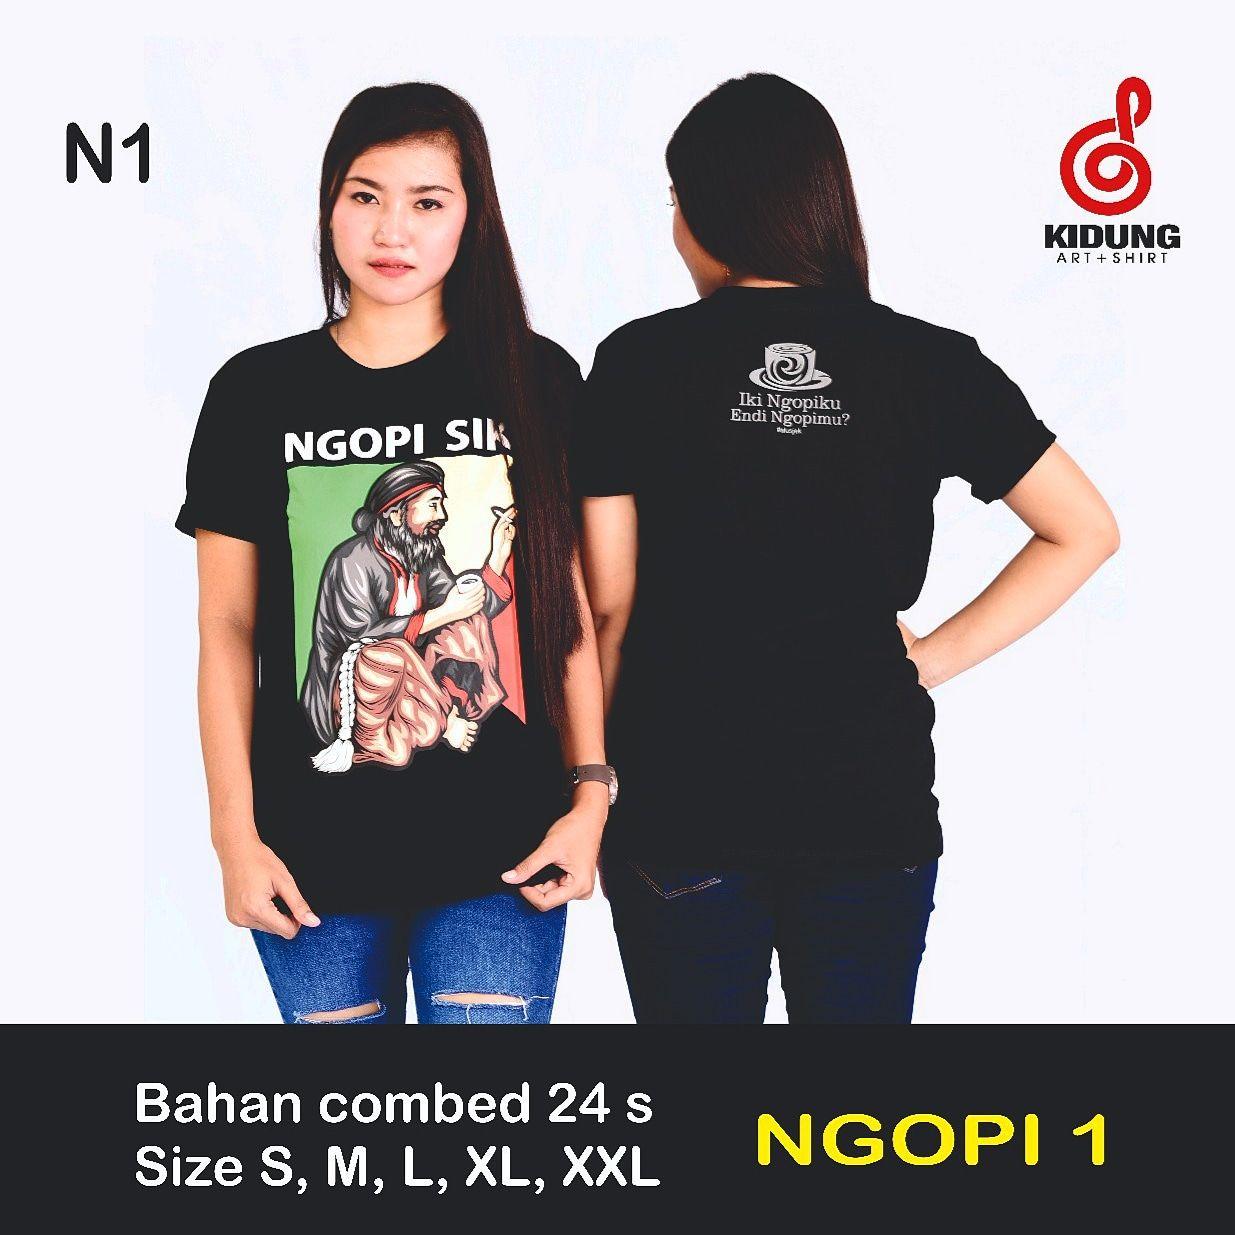 Kidung Clothing Ngopi1